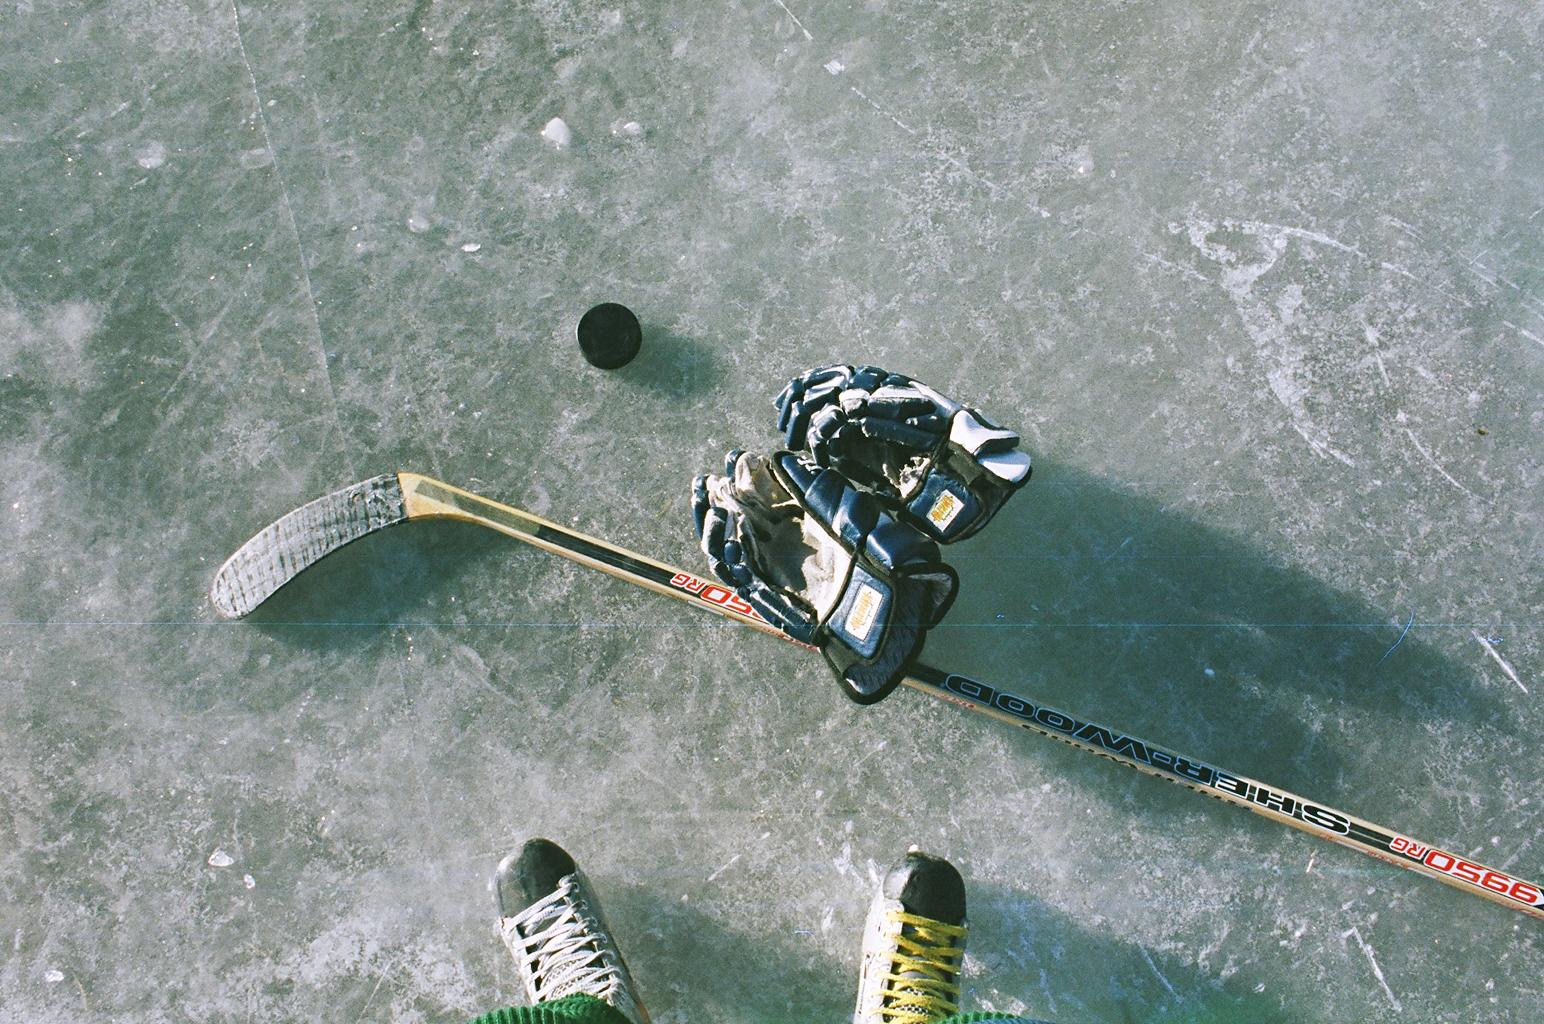 ajwells_pond_hockey-1.jpg